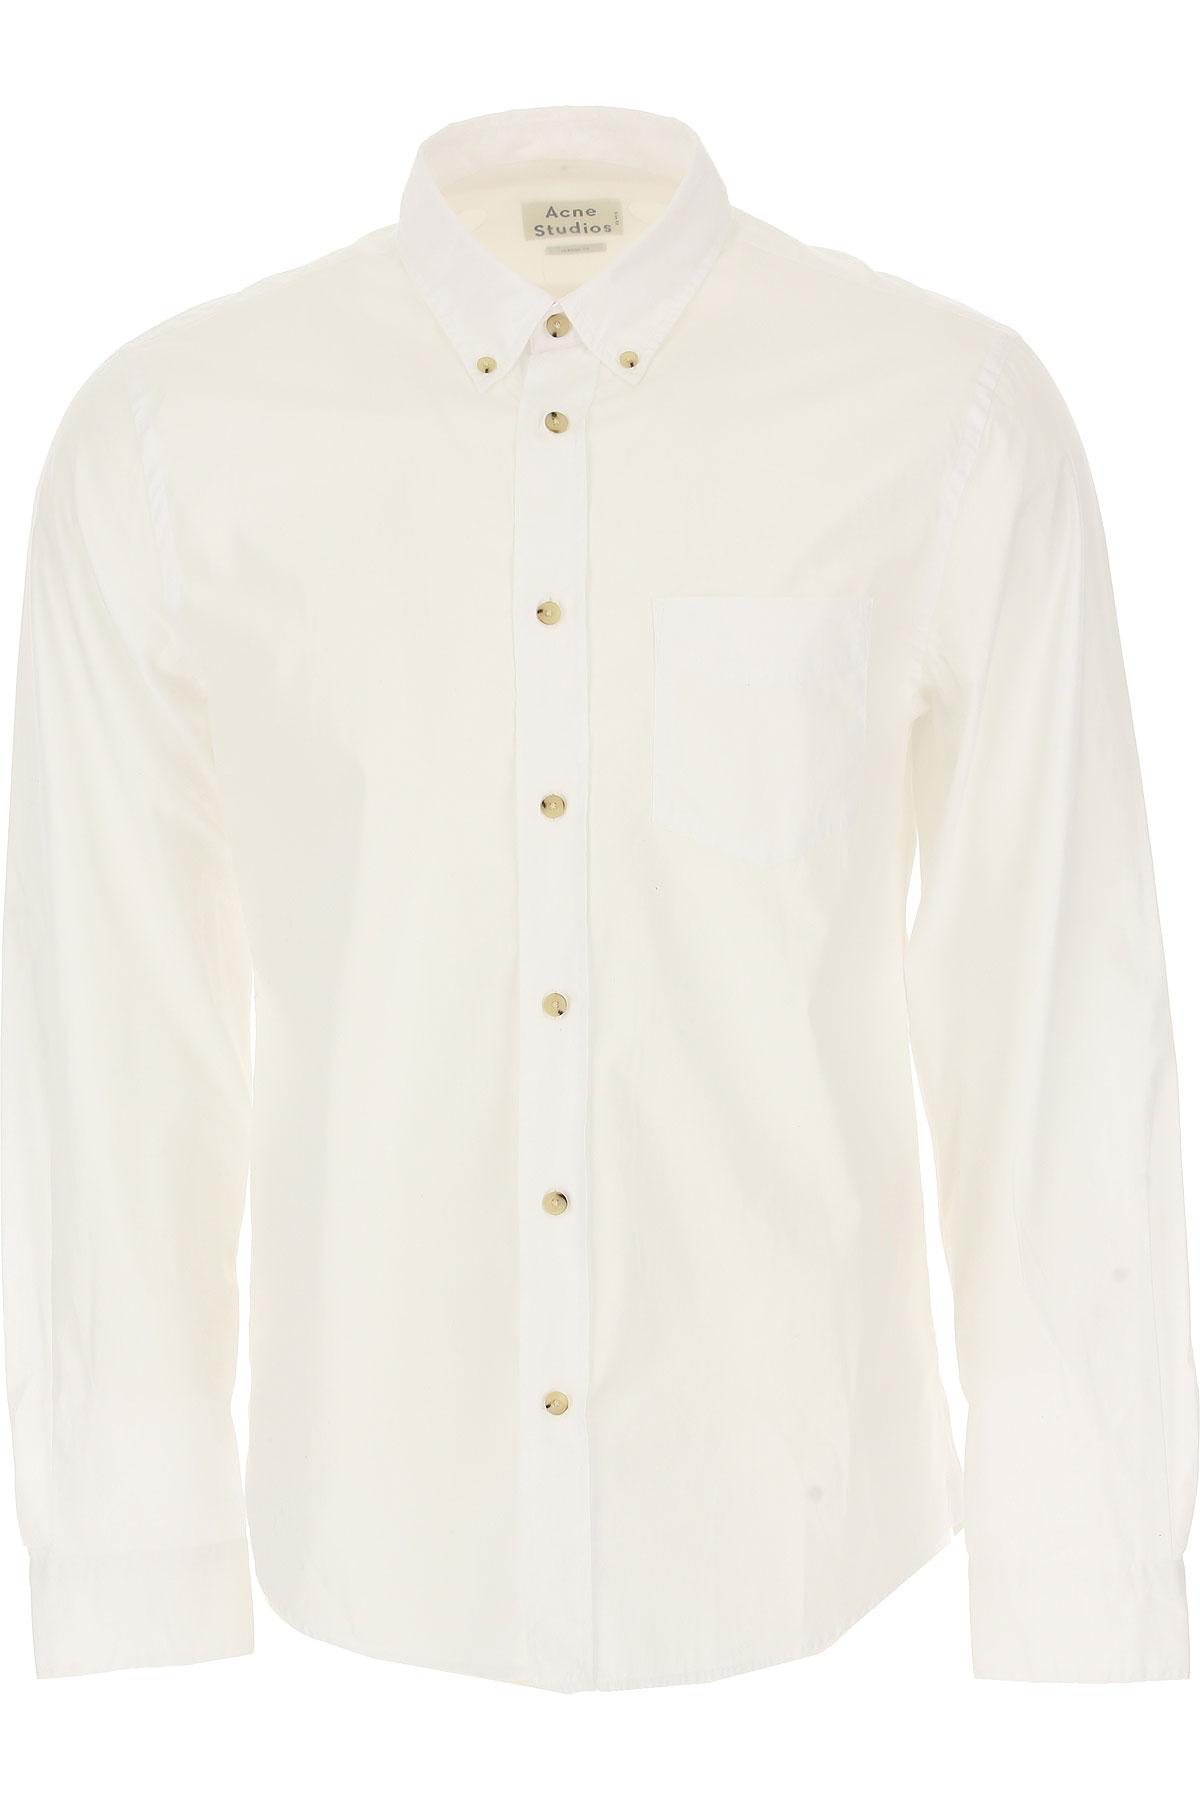 Image of Acne Studios Shirt for Men, White, Cotton, 2017, 30 32 34 36